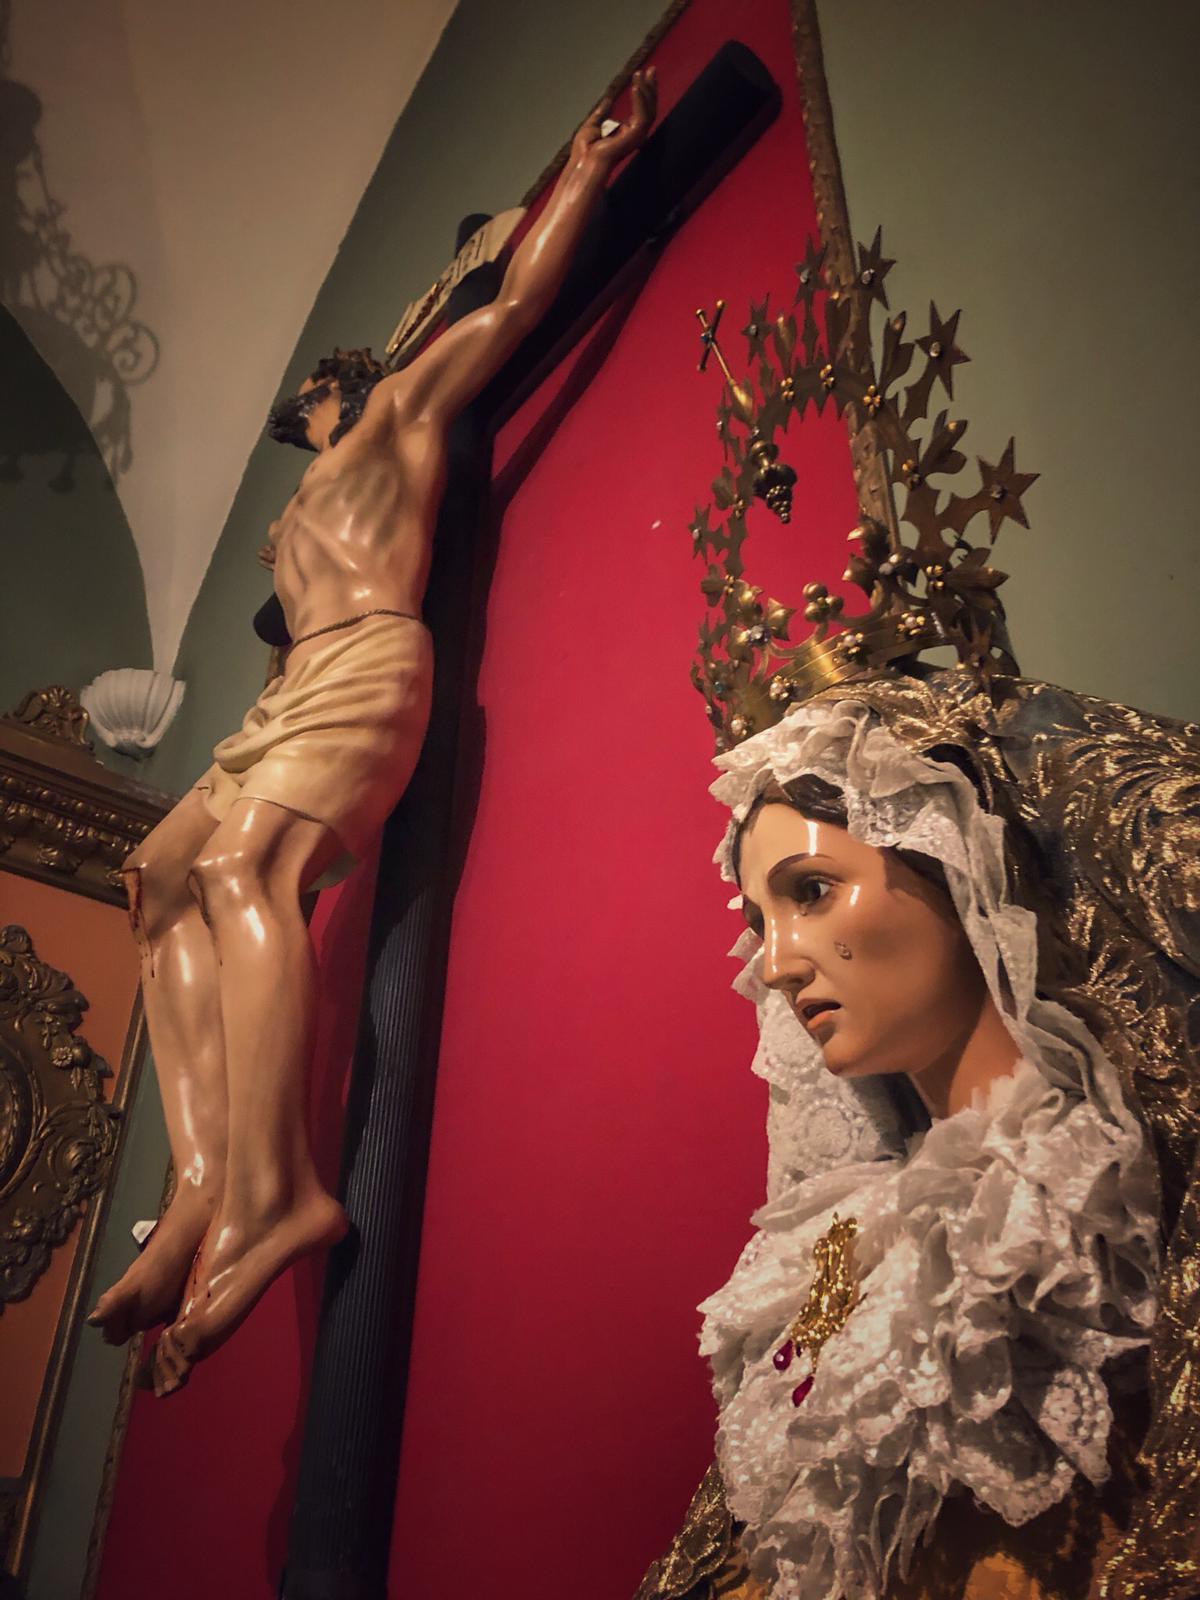 www.lignumcrucis.es-vera-cruz-santa-coloma-del-gramanet-titulares-13